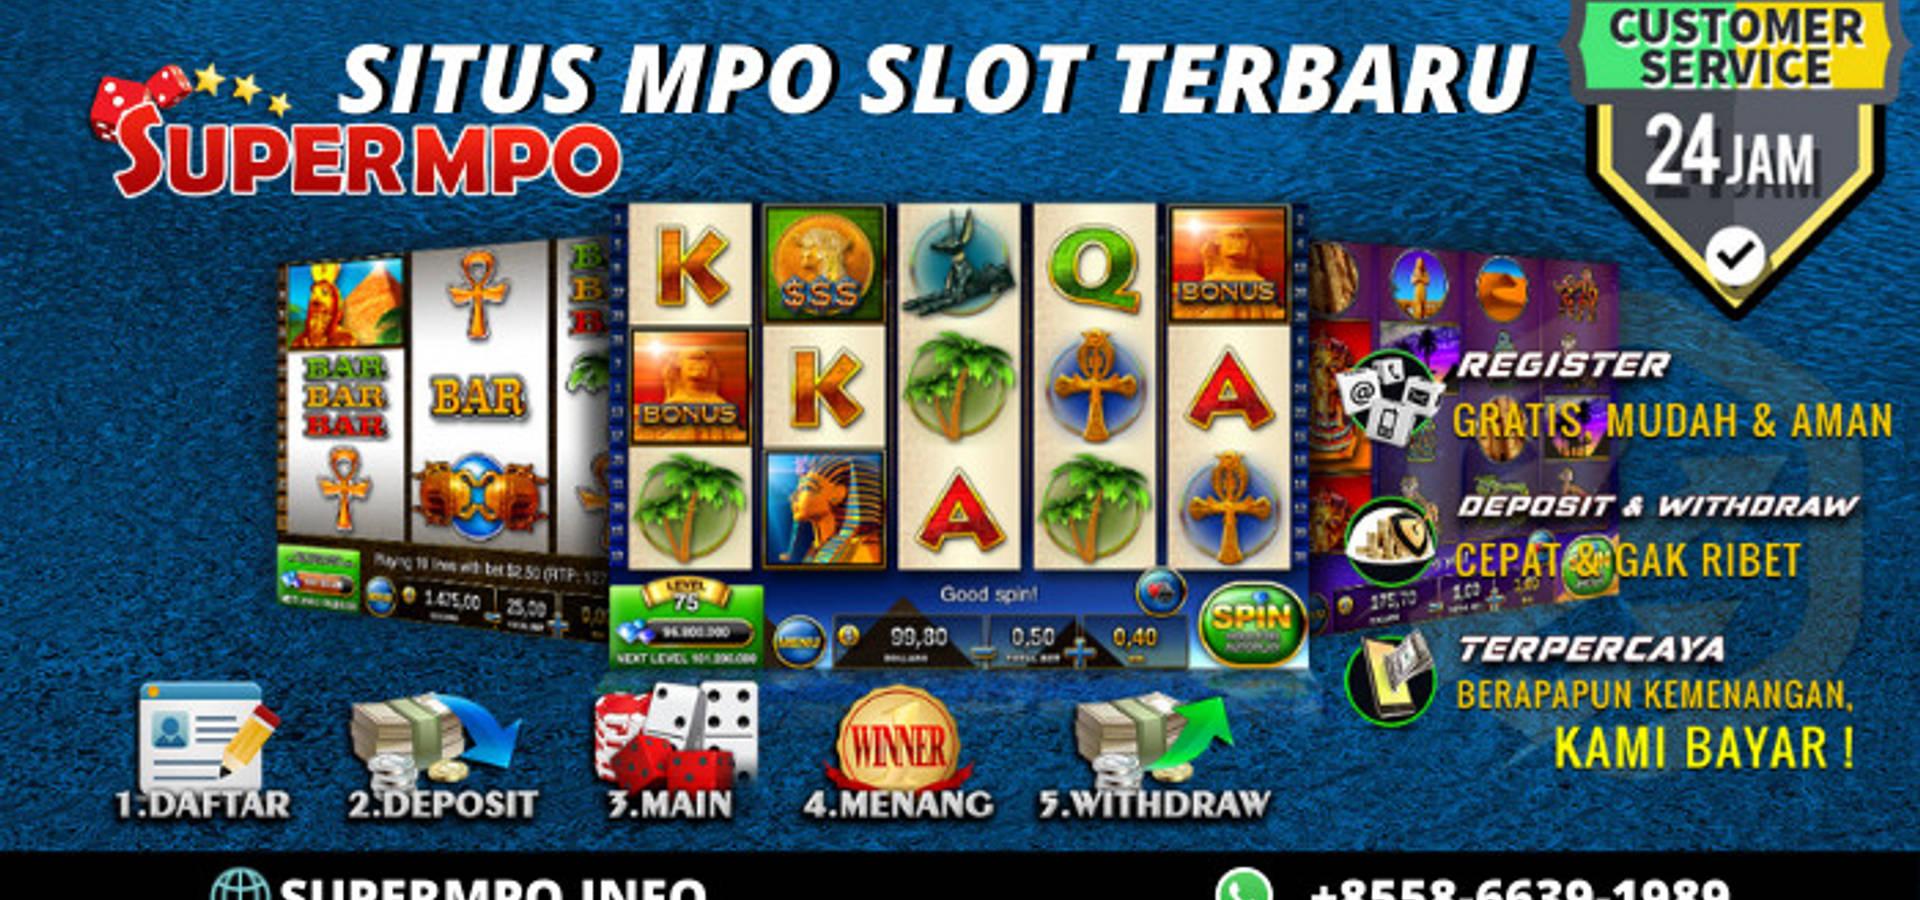 Situs Qq Slot Online Terbaru Deposit Via Pulsa Supermpo Homify